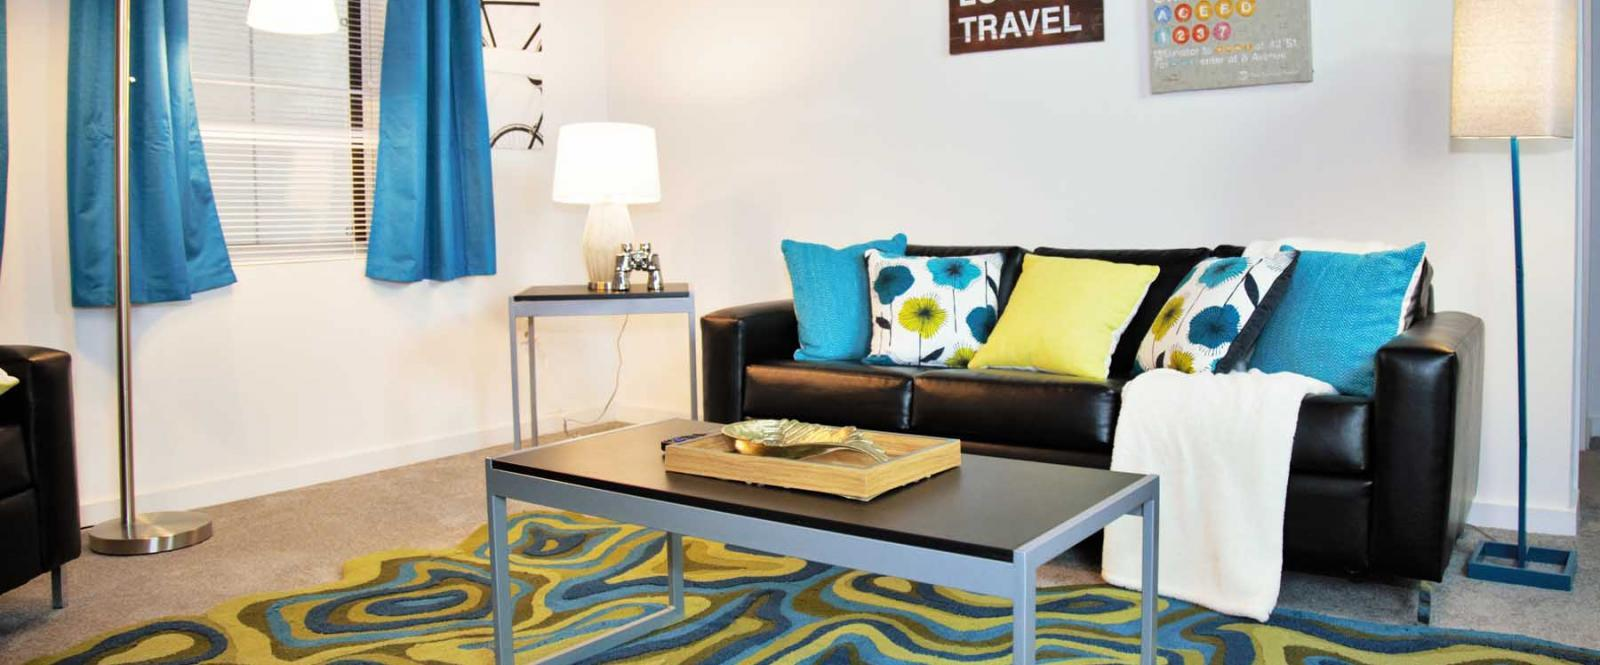 University-Lofts-Binghamton-Living-Room-Unilodgers